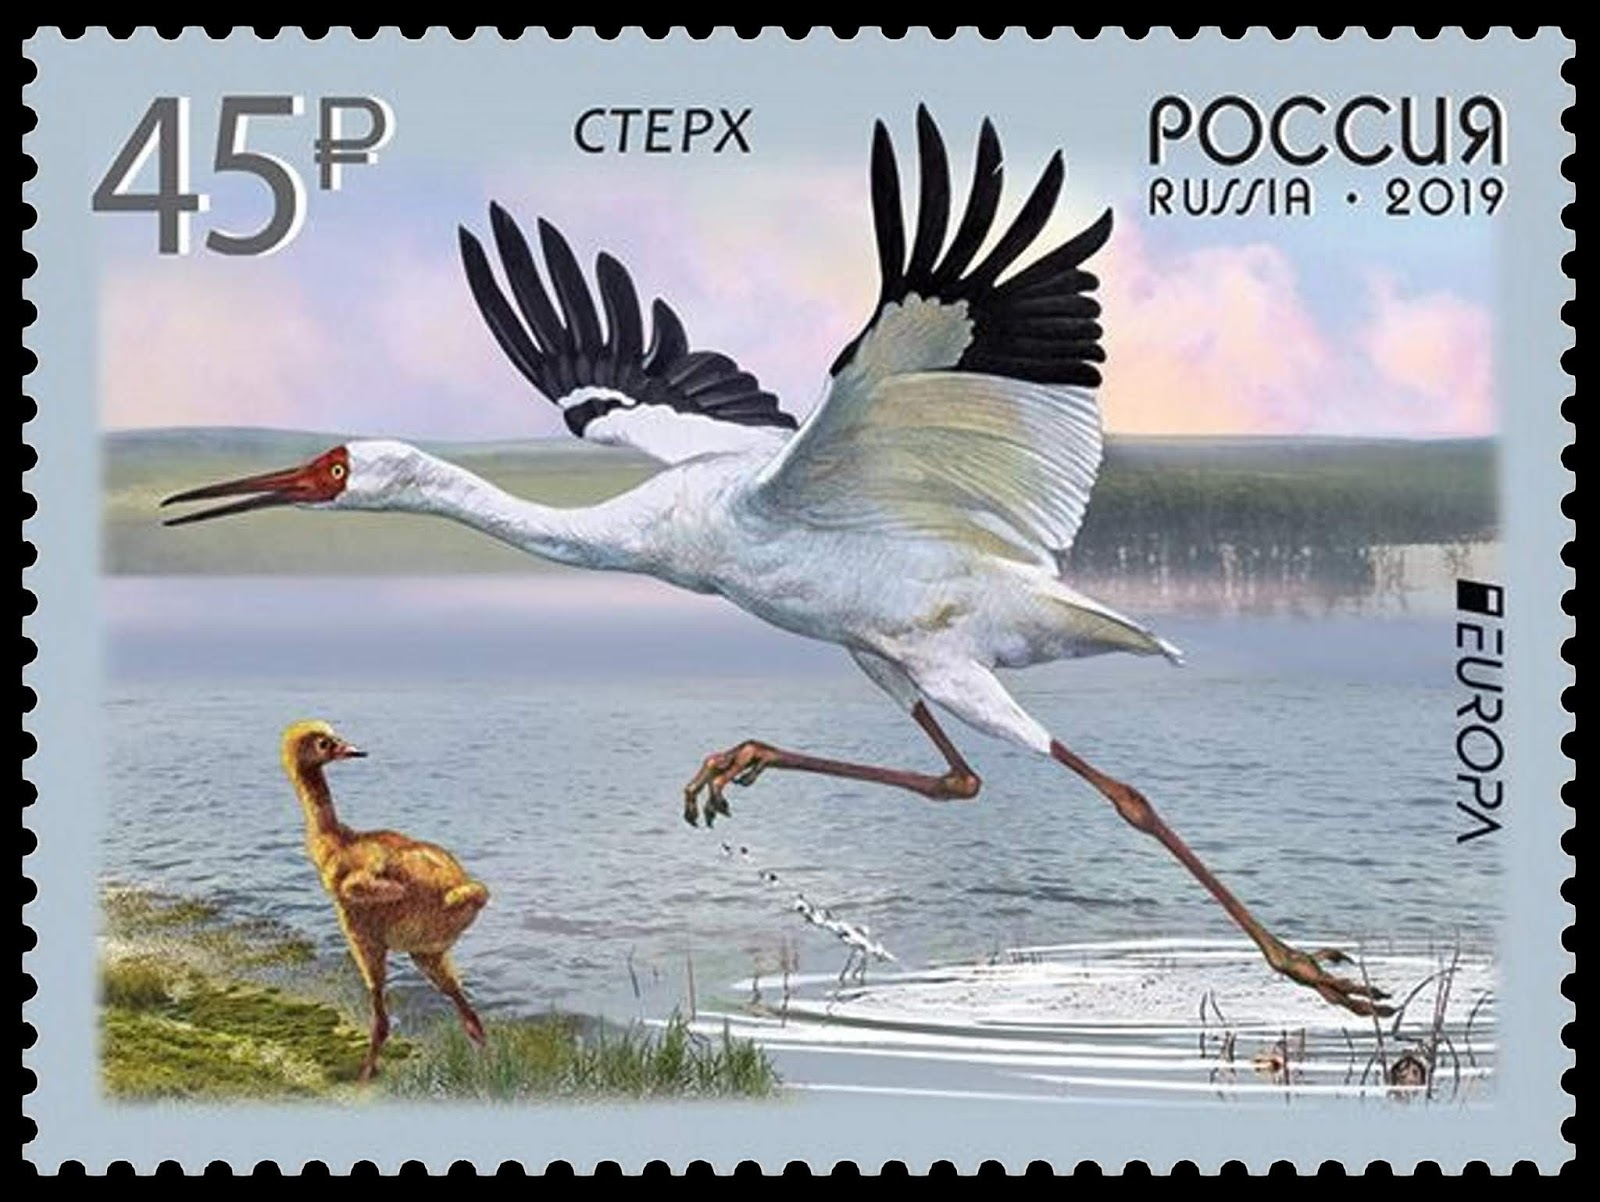 Russia - Europa 2019: National Birds (January 22, 2019)